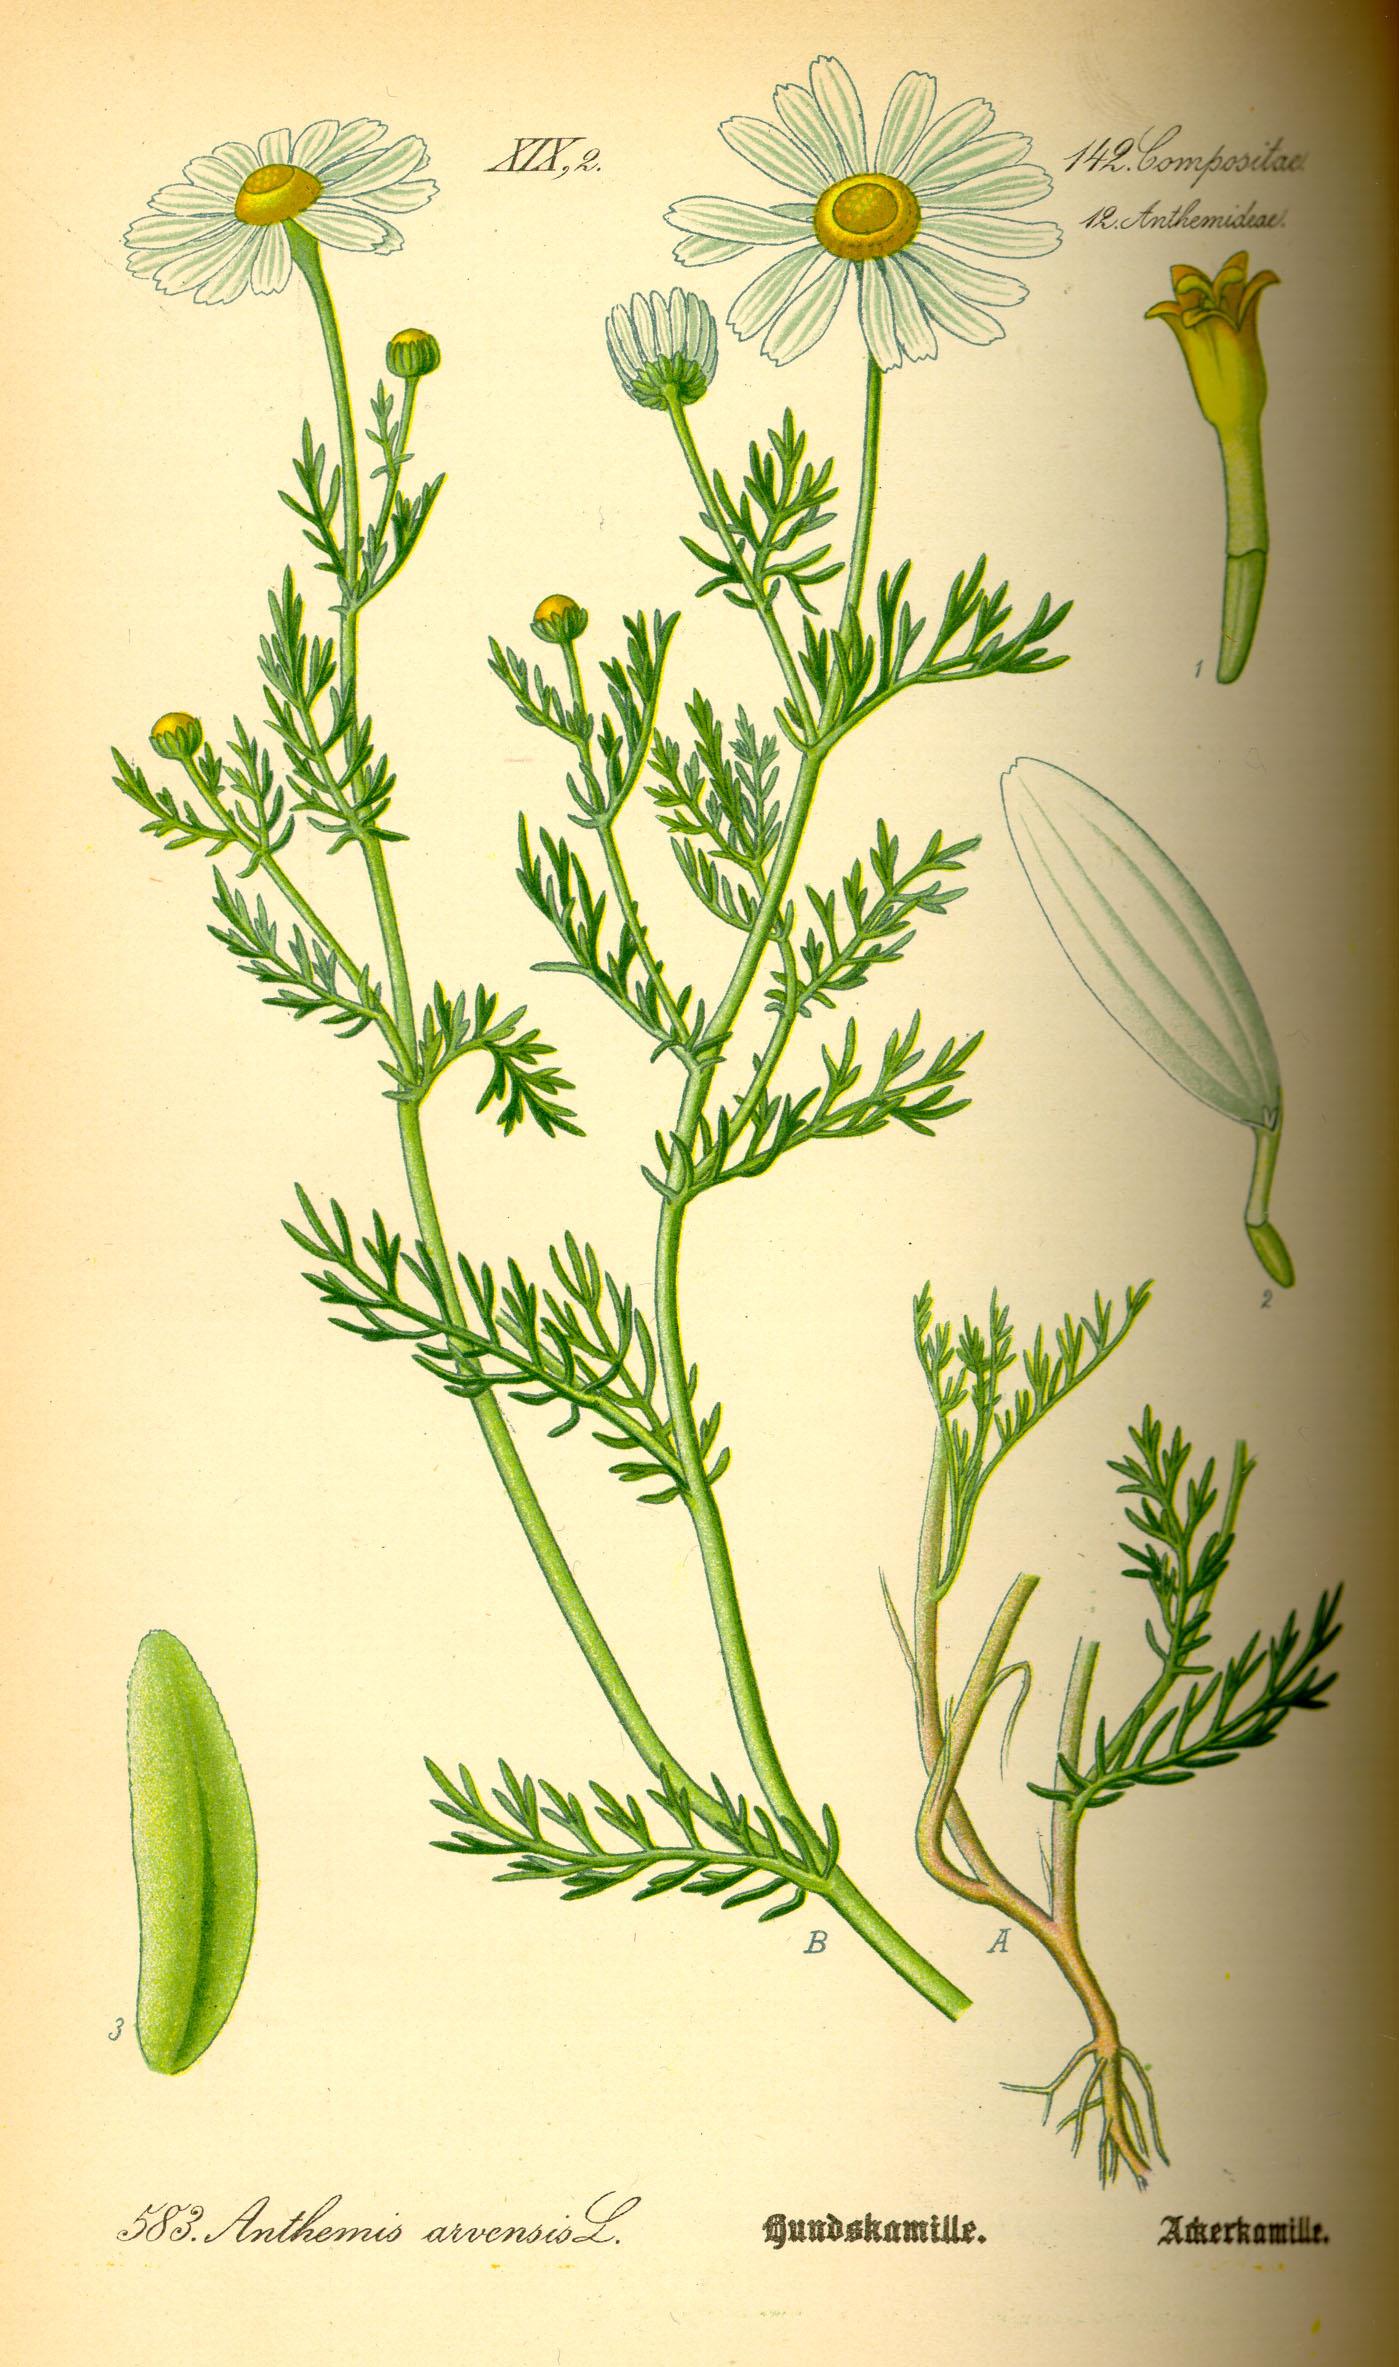 Depiction of Anthemis arvensis